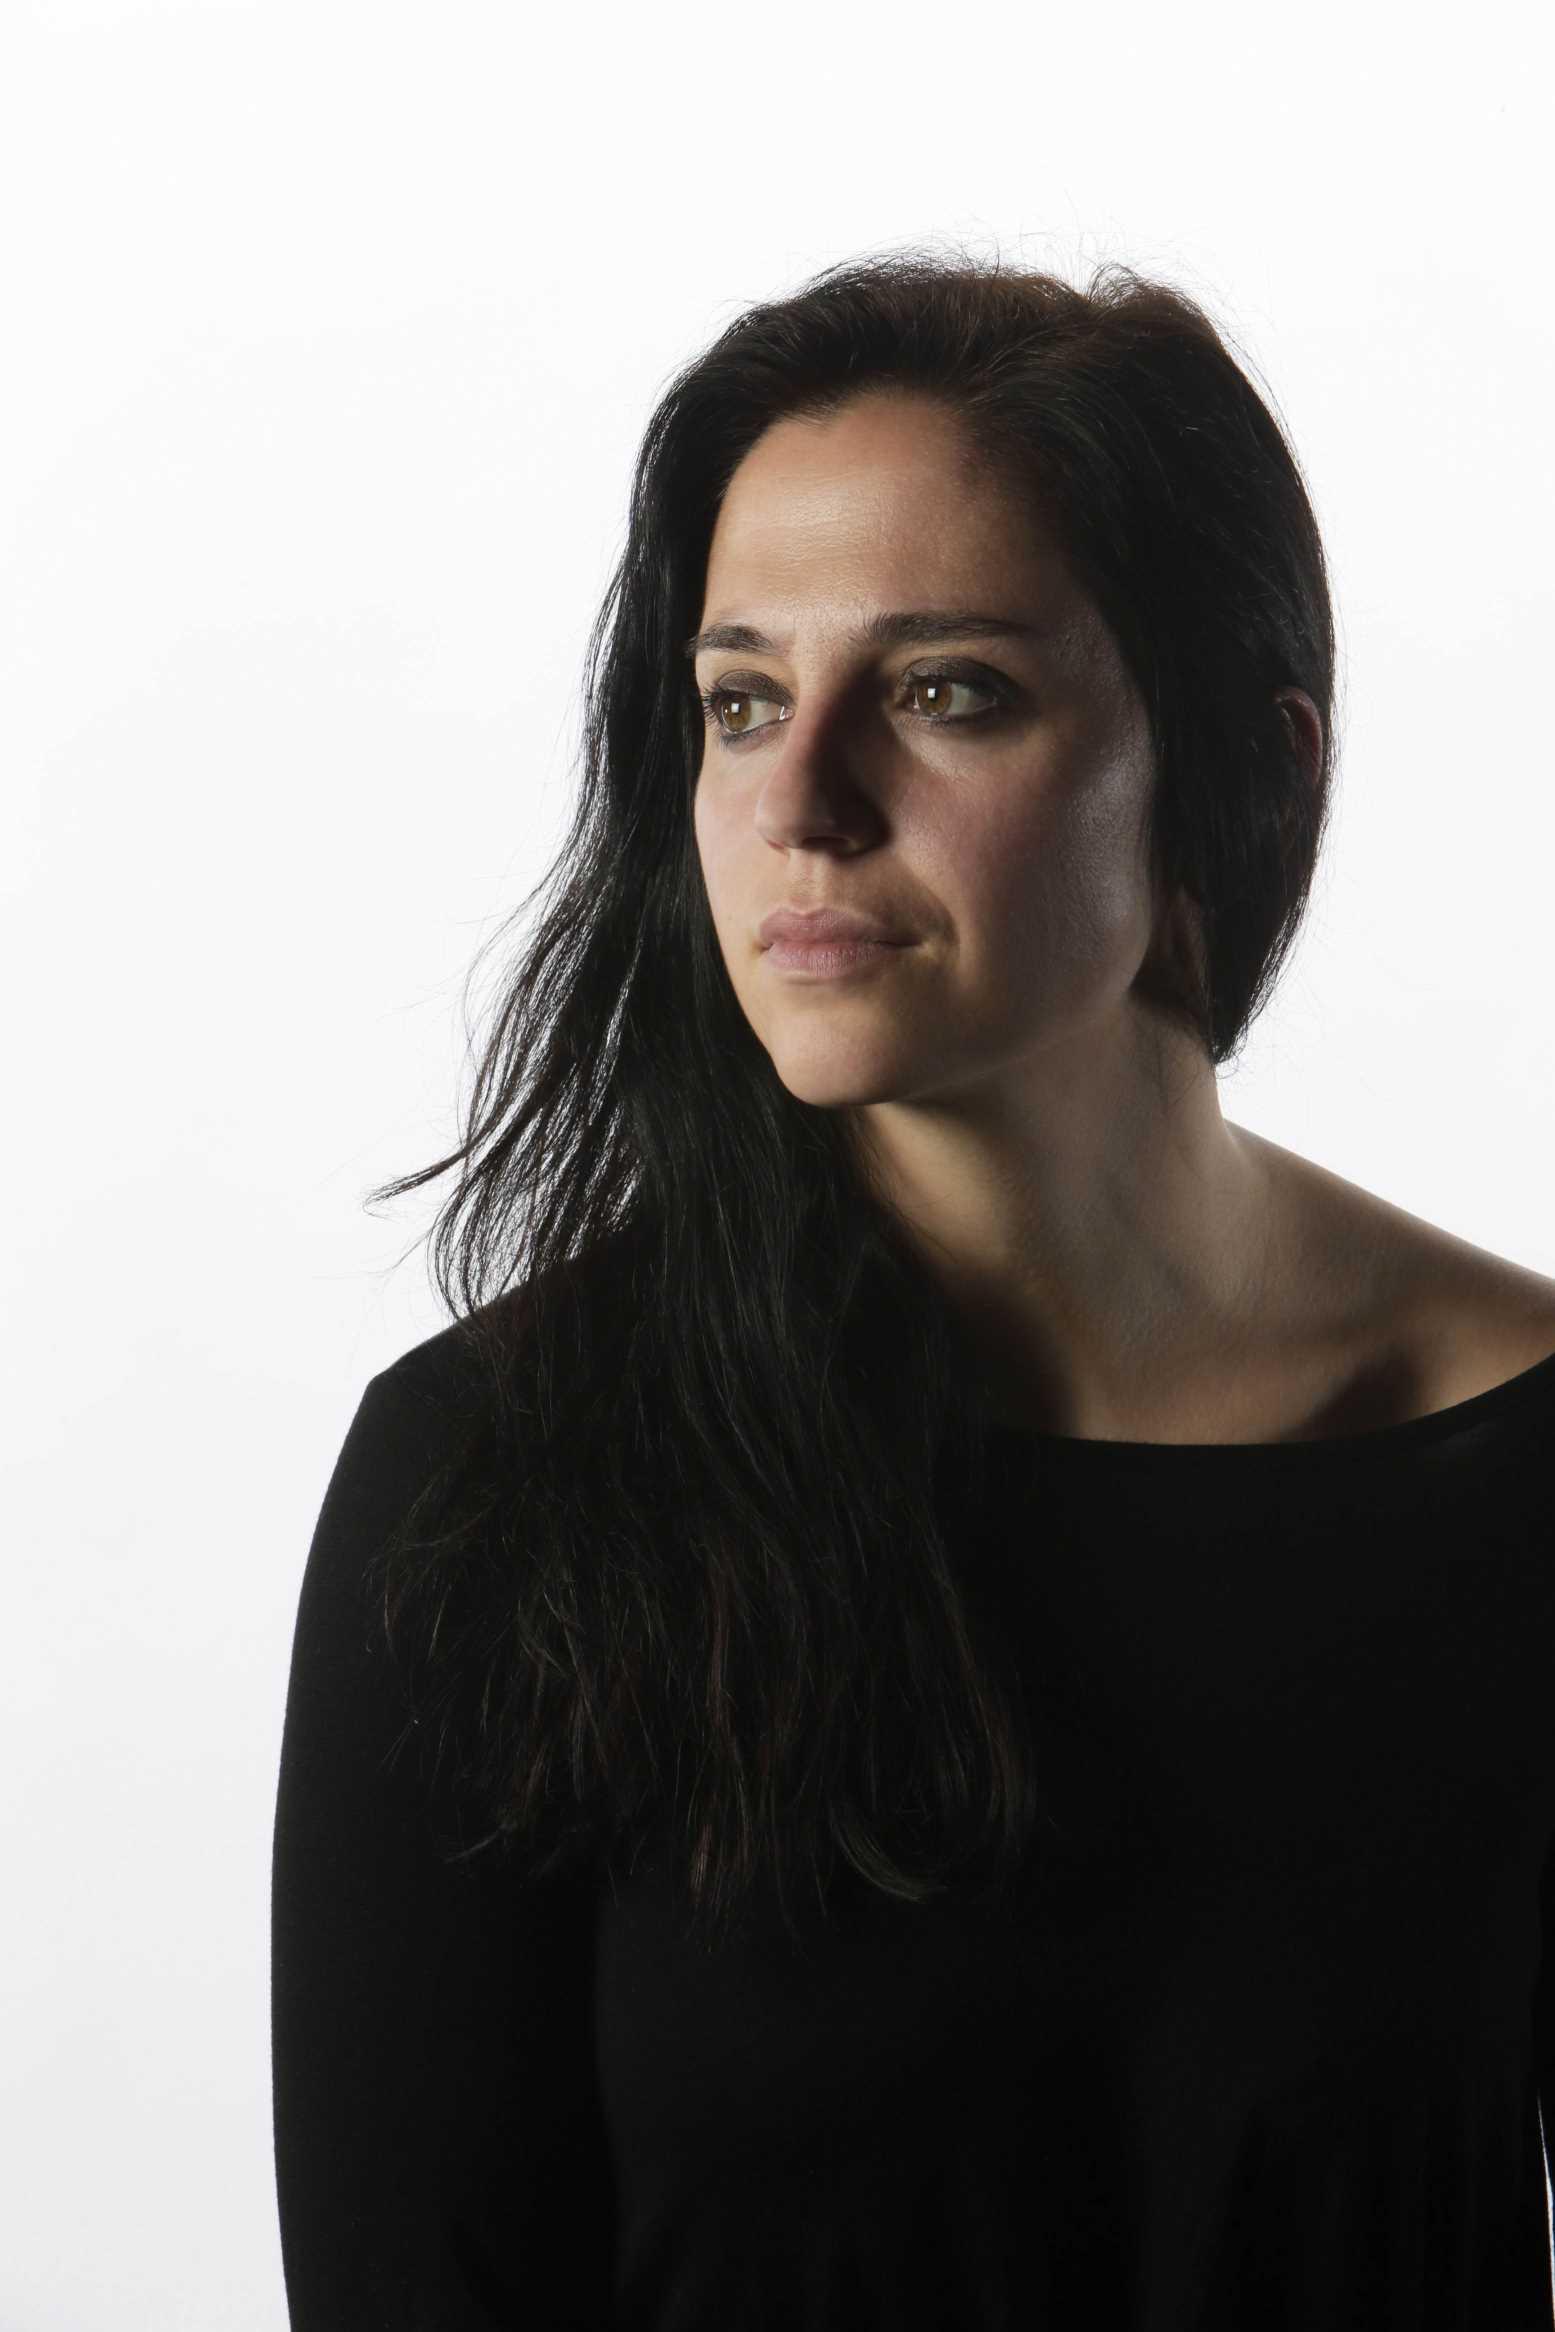 Lara Morgado